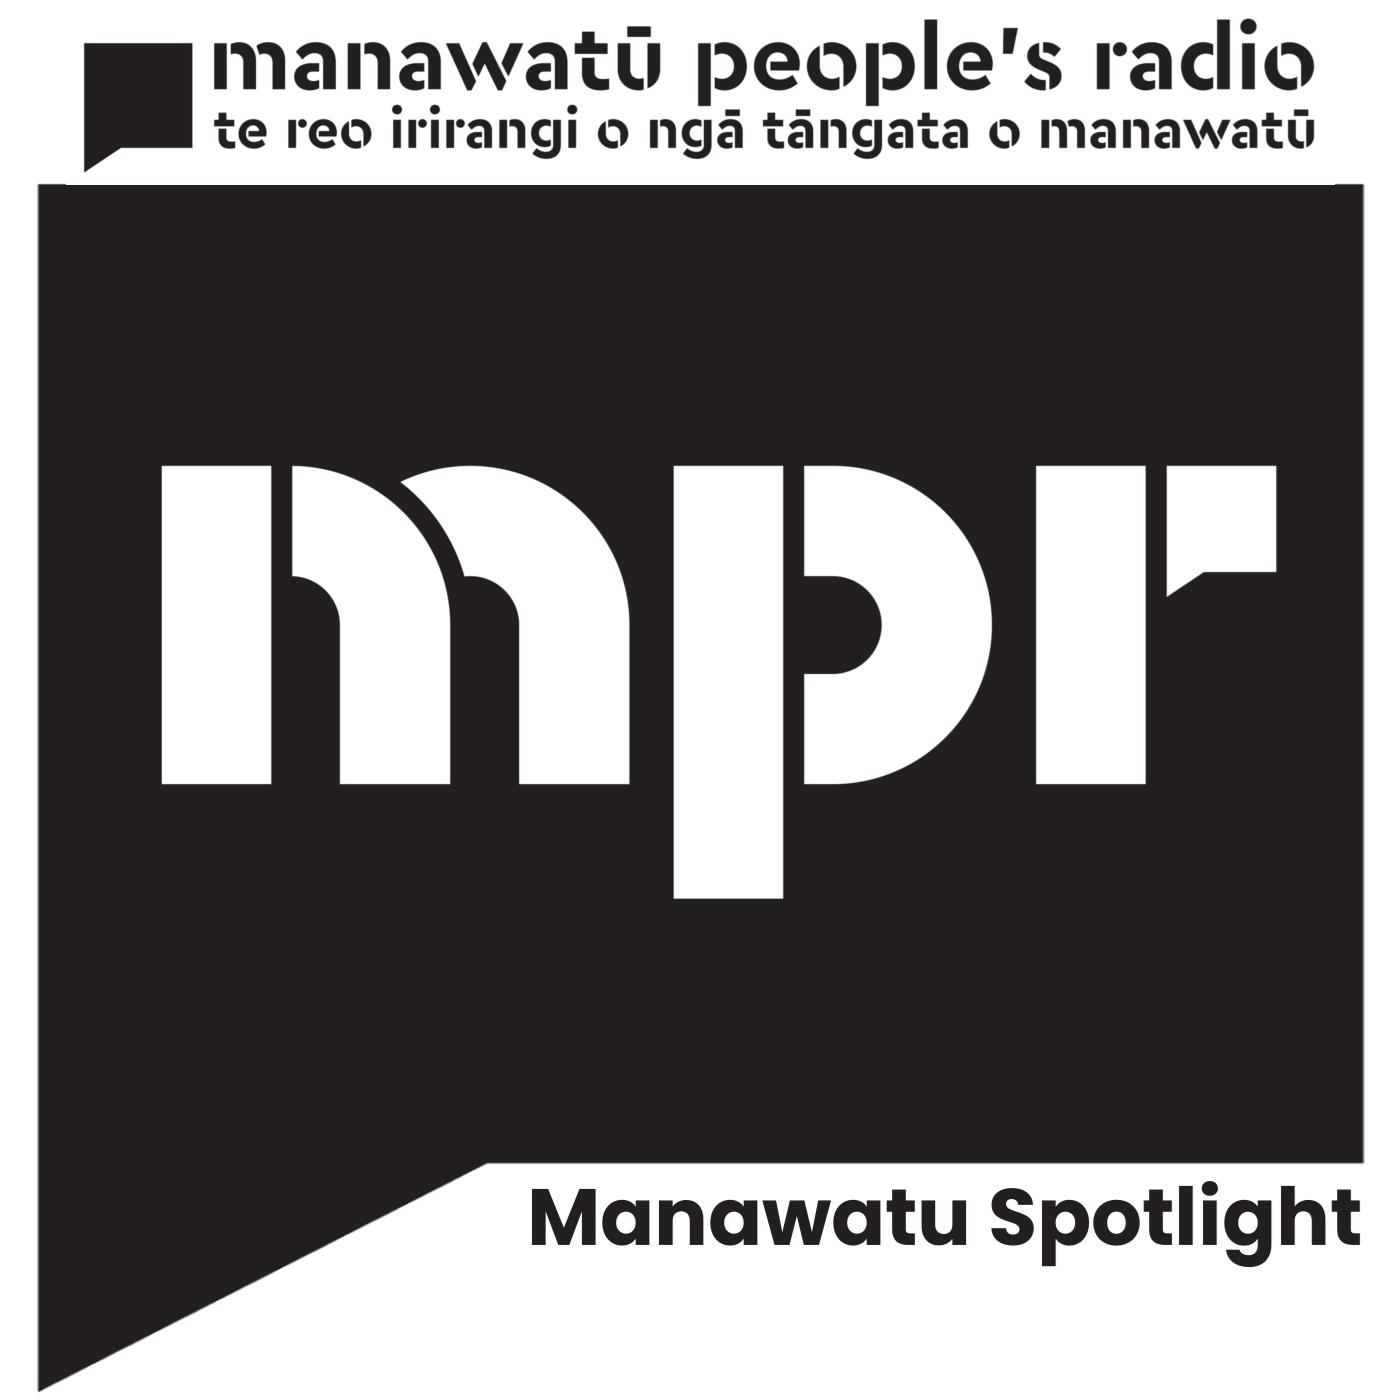 https://static.accessradio.org/StationFolder/manawatu/Images/MPR - ManawatuSpot.png